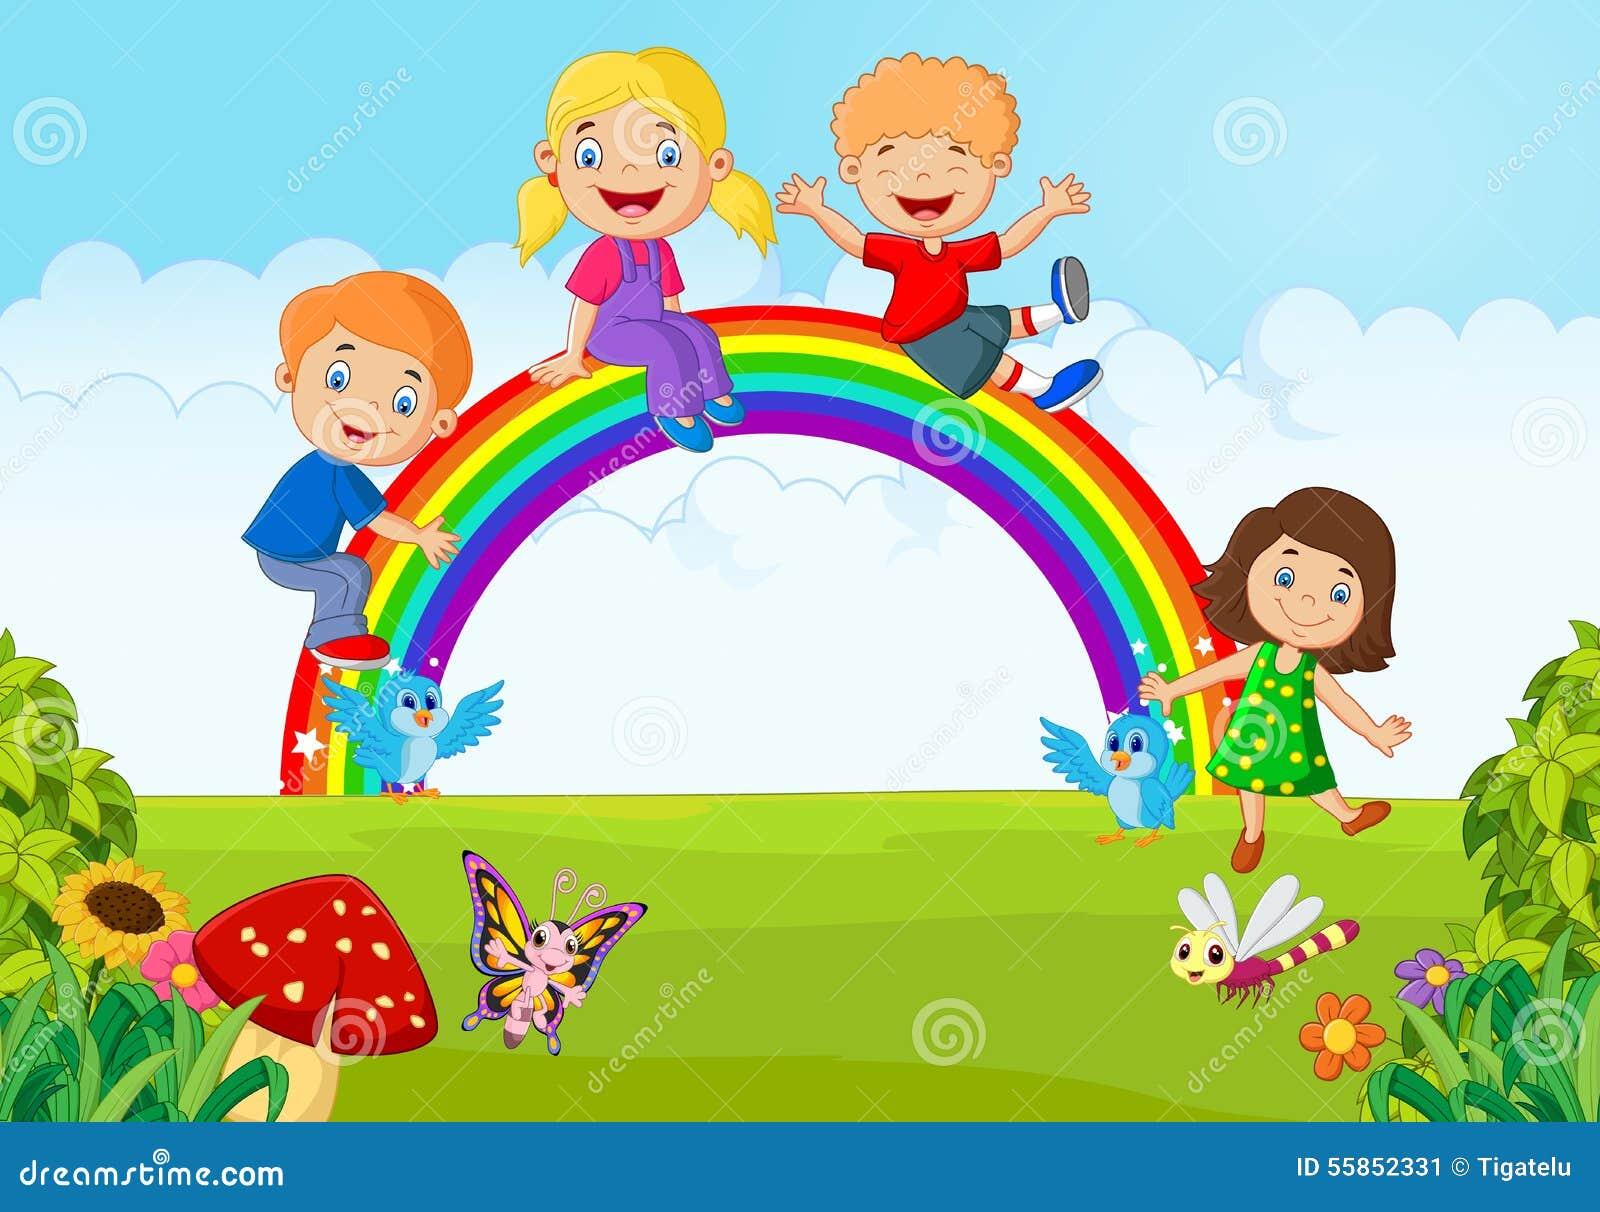 Ilustra%C3%A7%C3%A3o Stock Crian%C3%A7as Felizes Dos Desenhos Animados Que Sentam Se No Arco %C3%ADris Image55852331 on Illustration Worksheets For Kindergarten